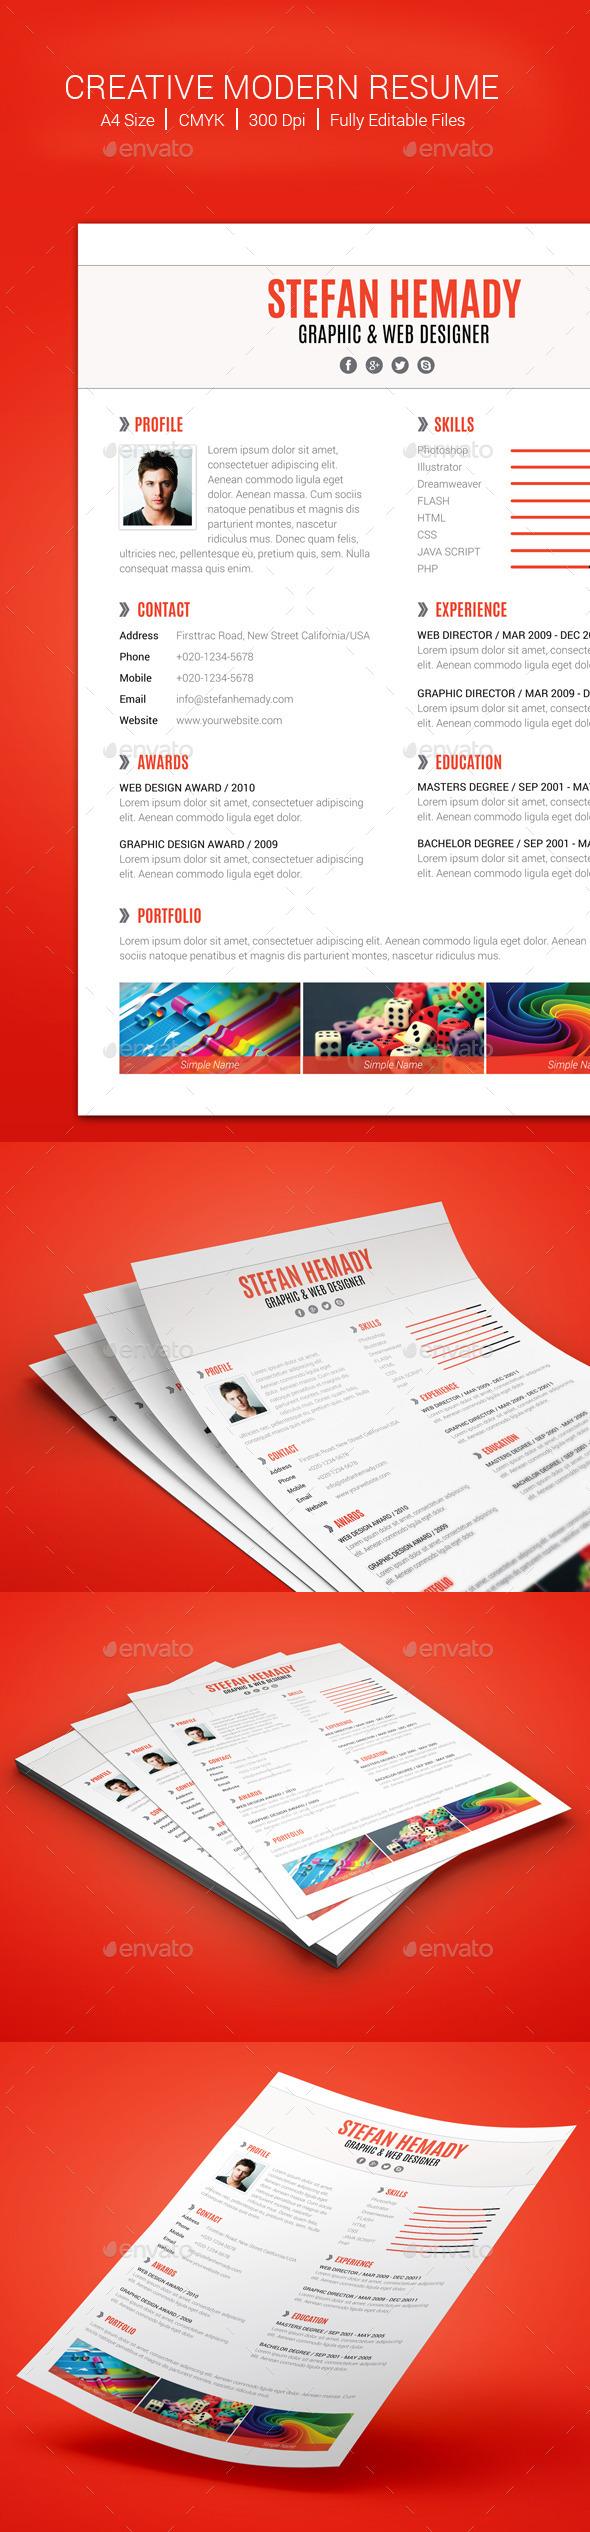 GraphicRiver Creative Modern Resume 10548549